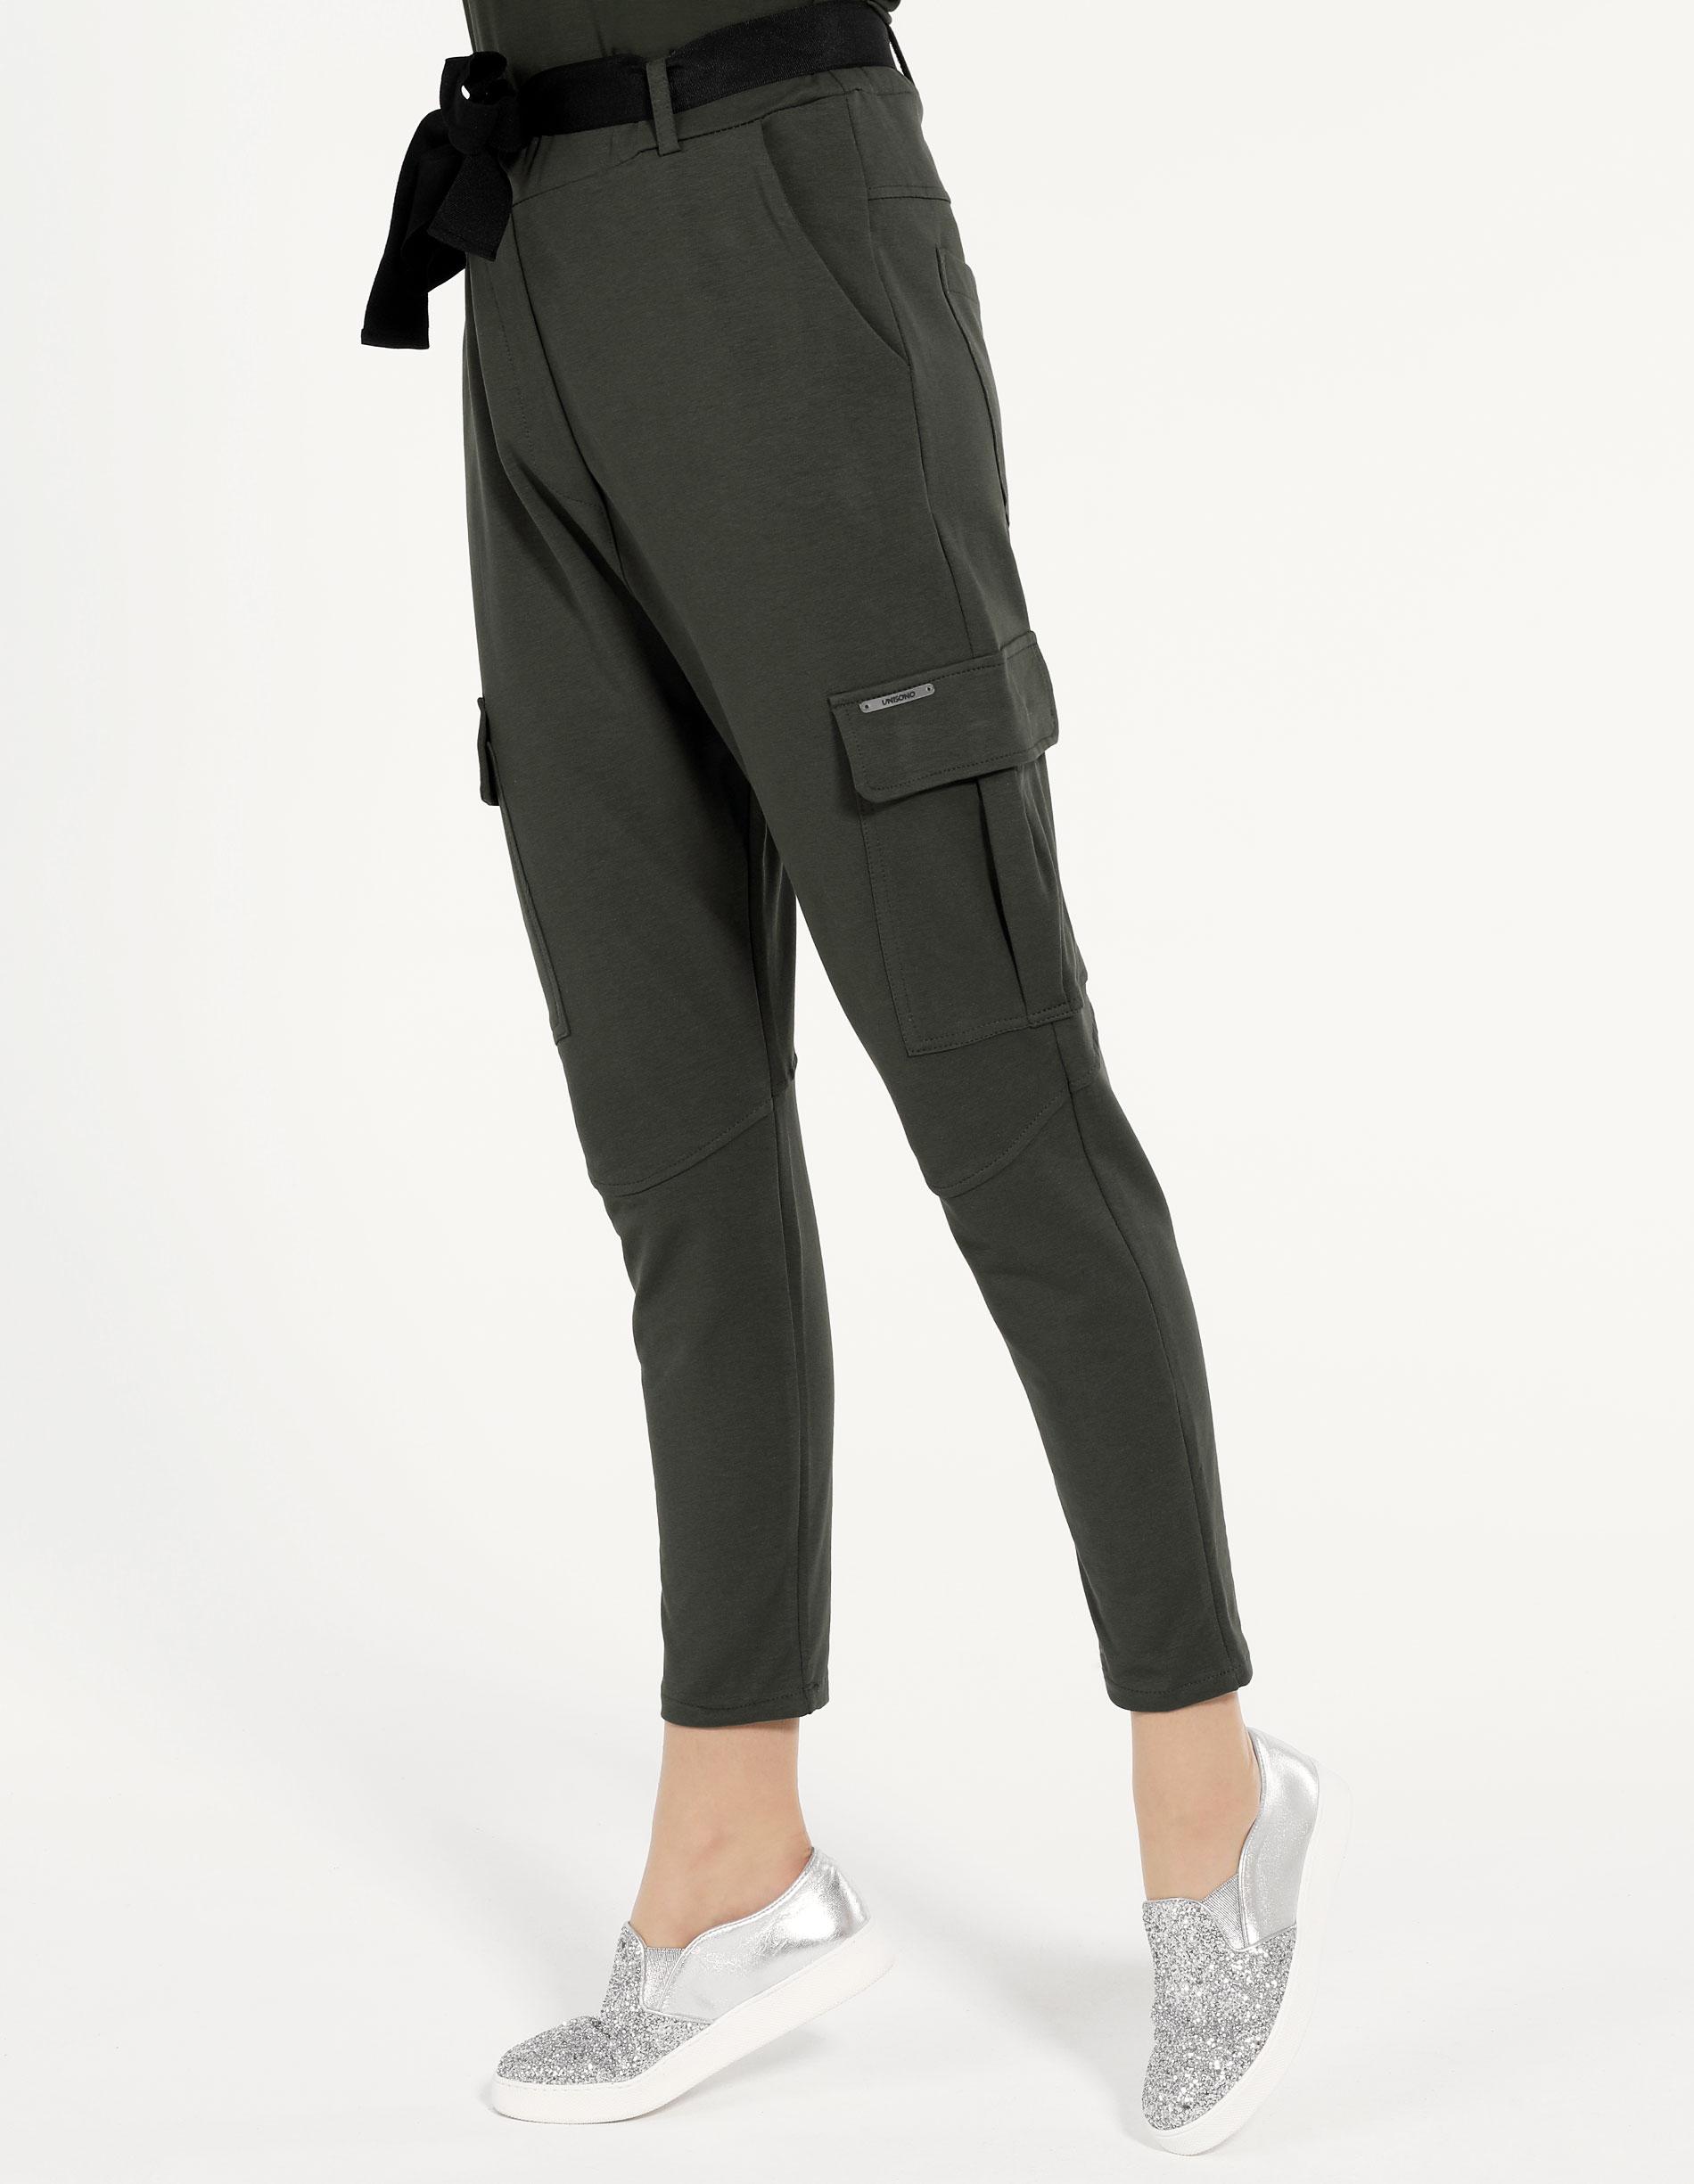 Spodnie - 30-68006 MILI - Unisono